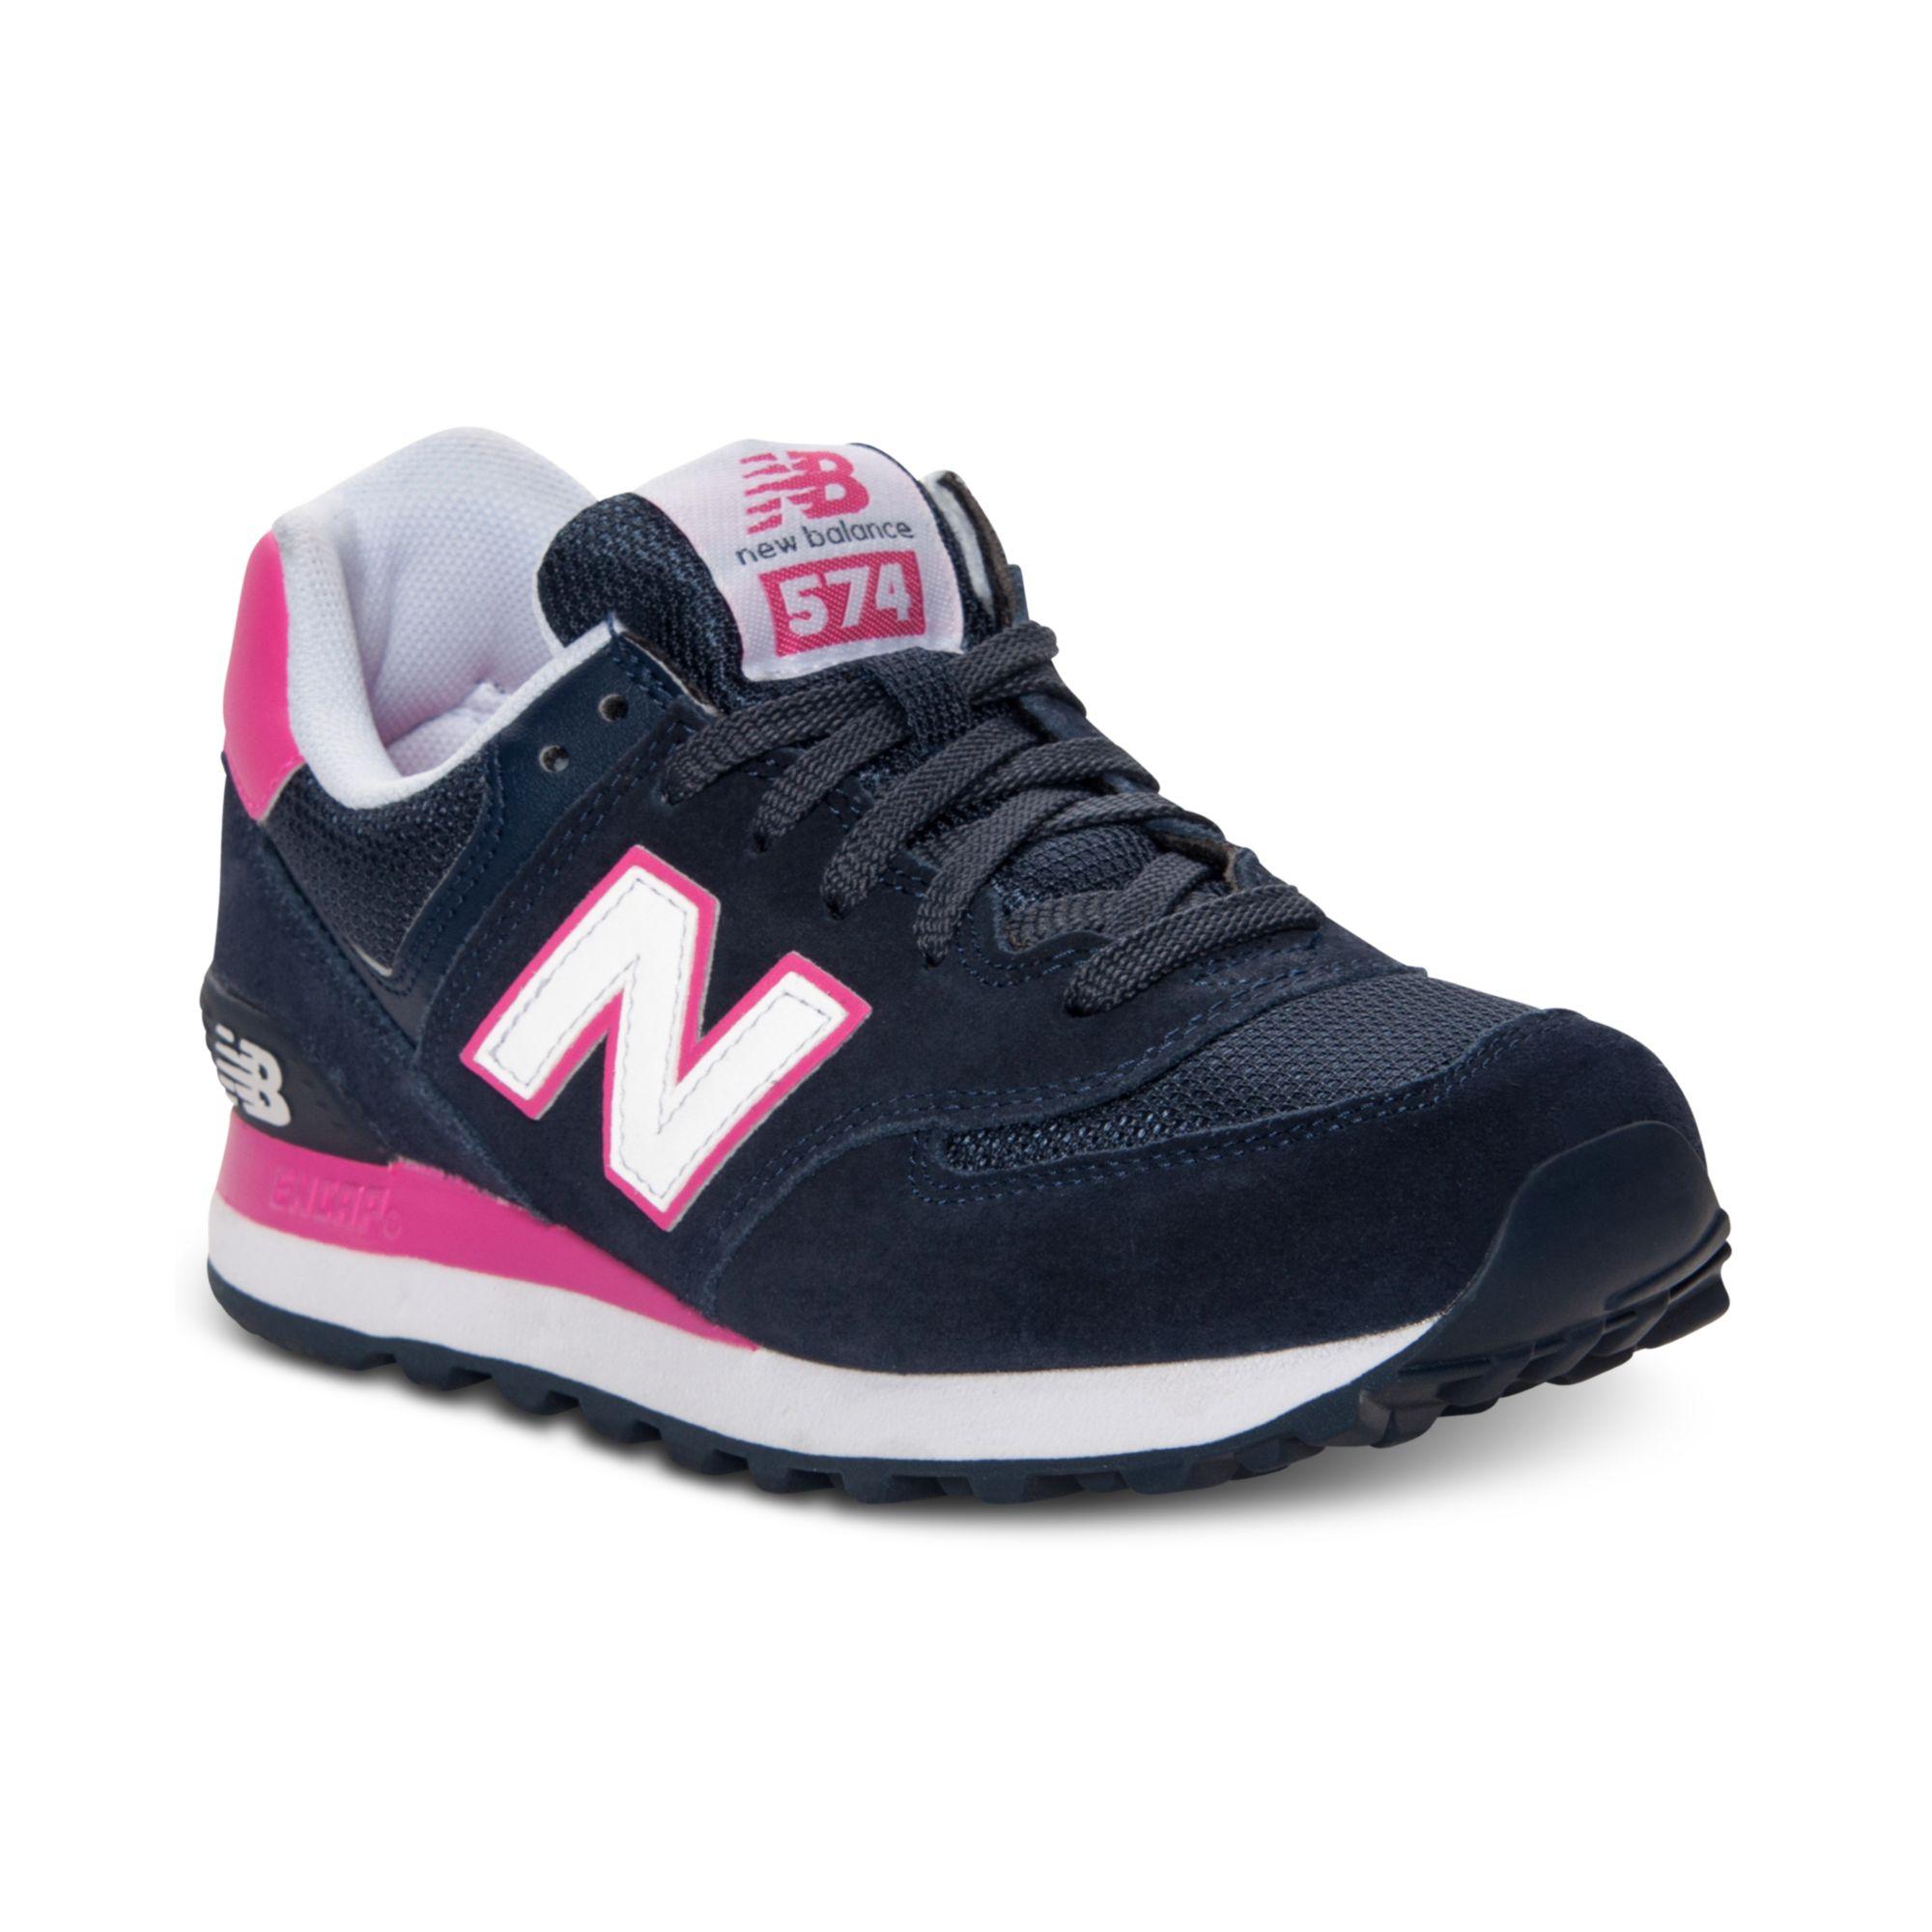 New Balance Black 574 Sneakers